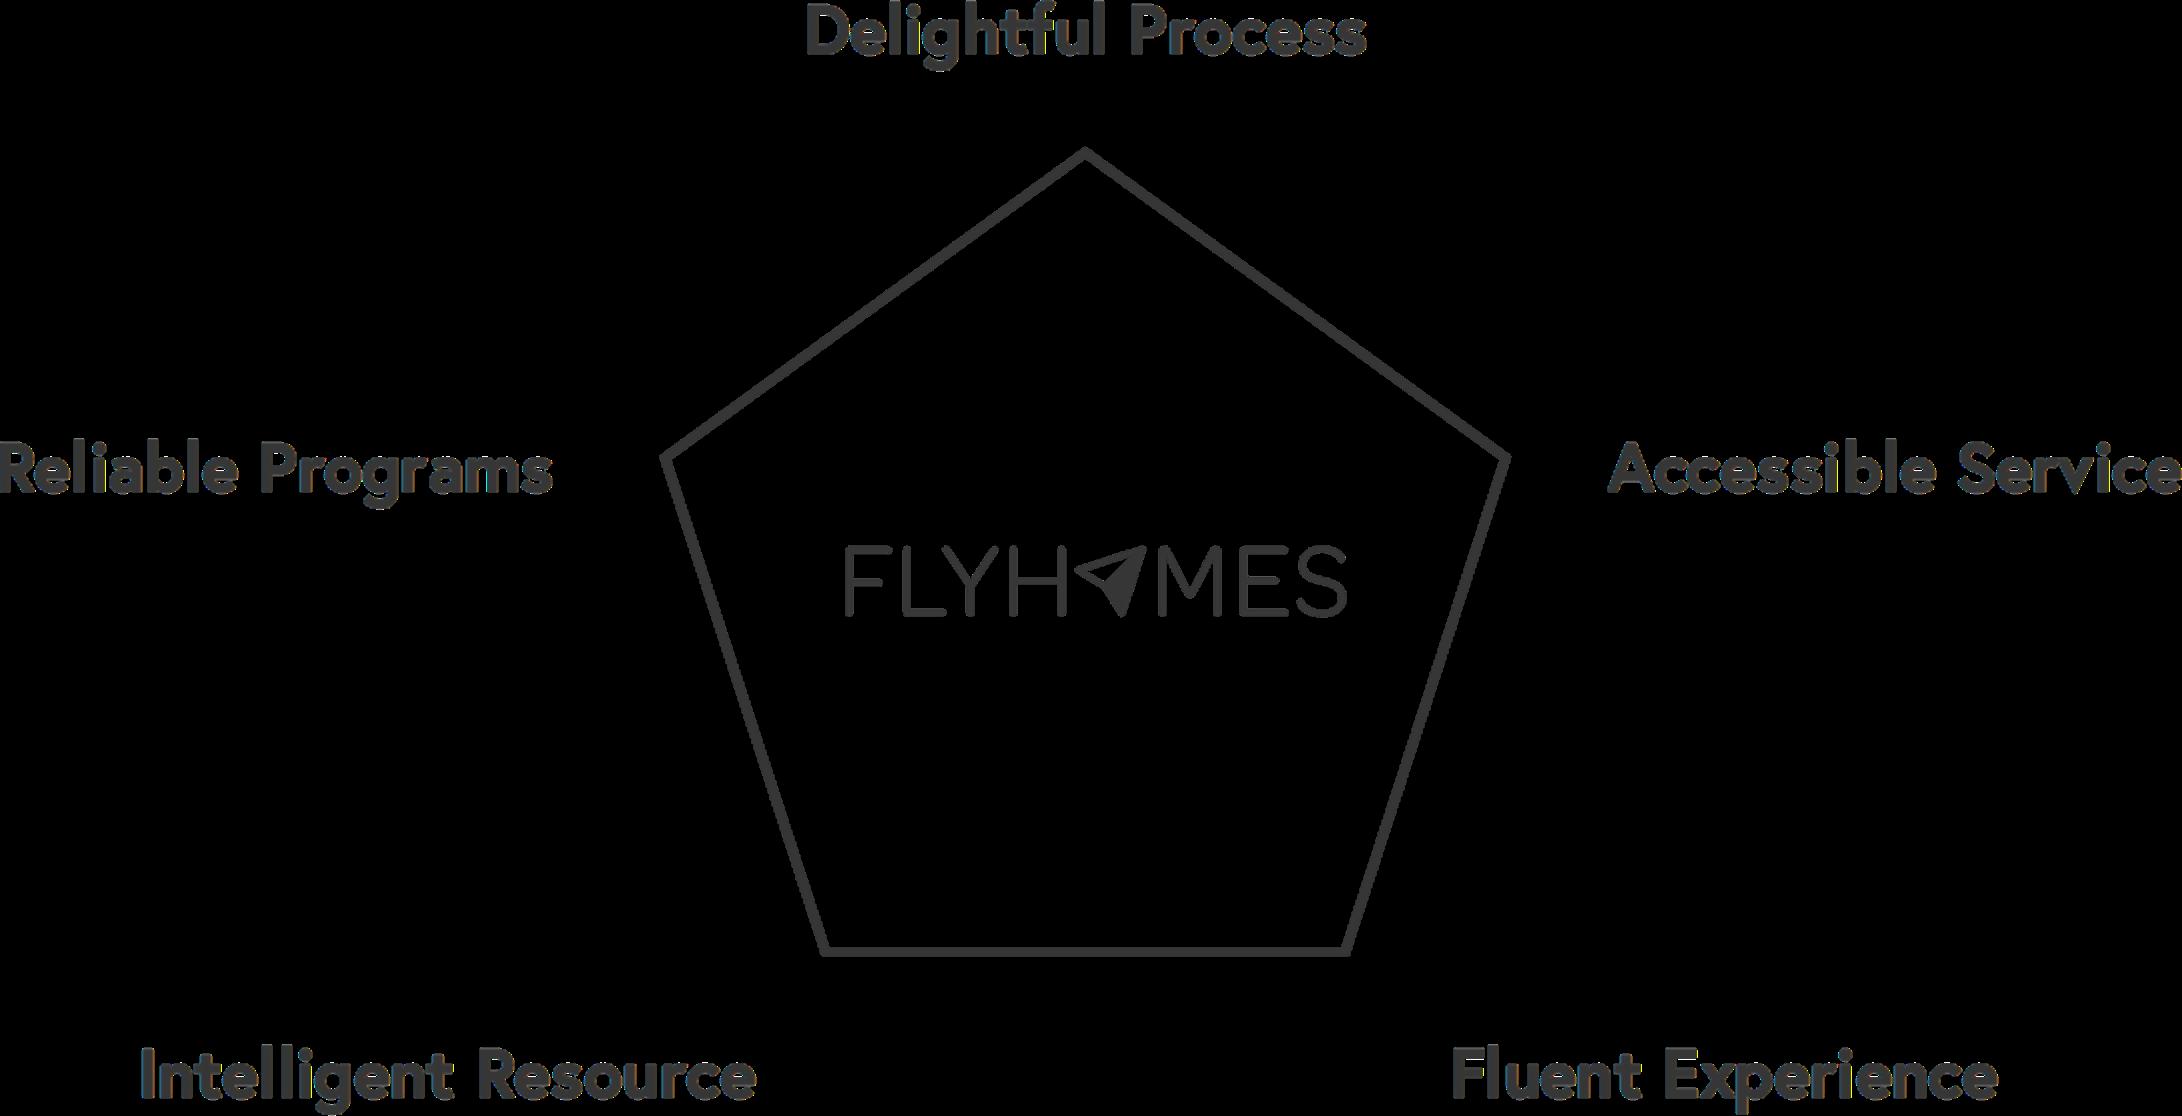 flyhomes brand attributes